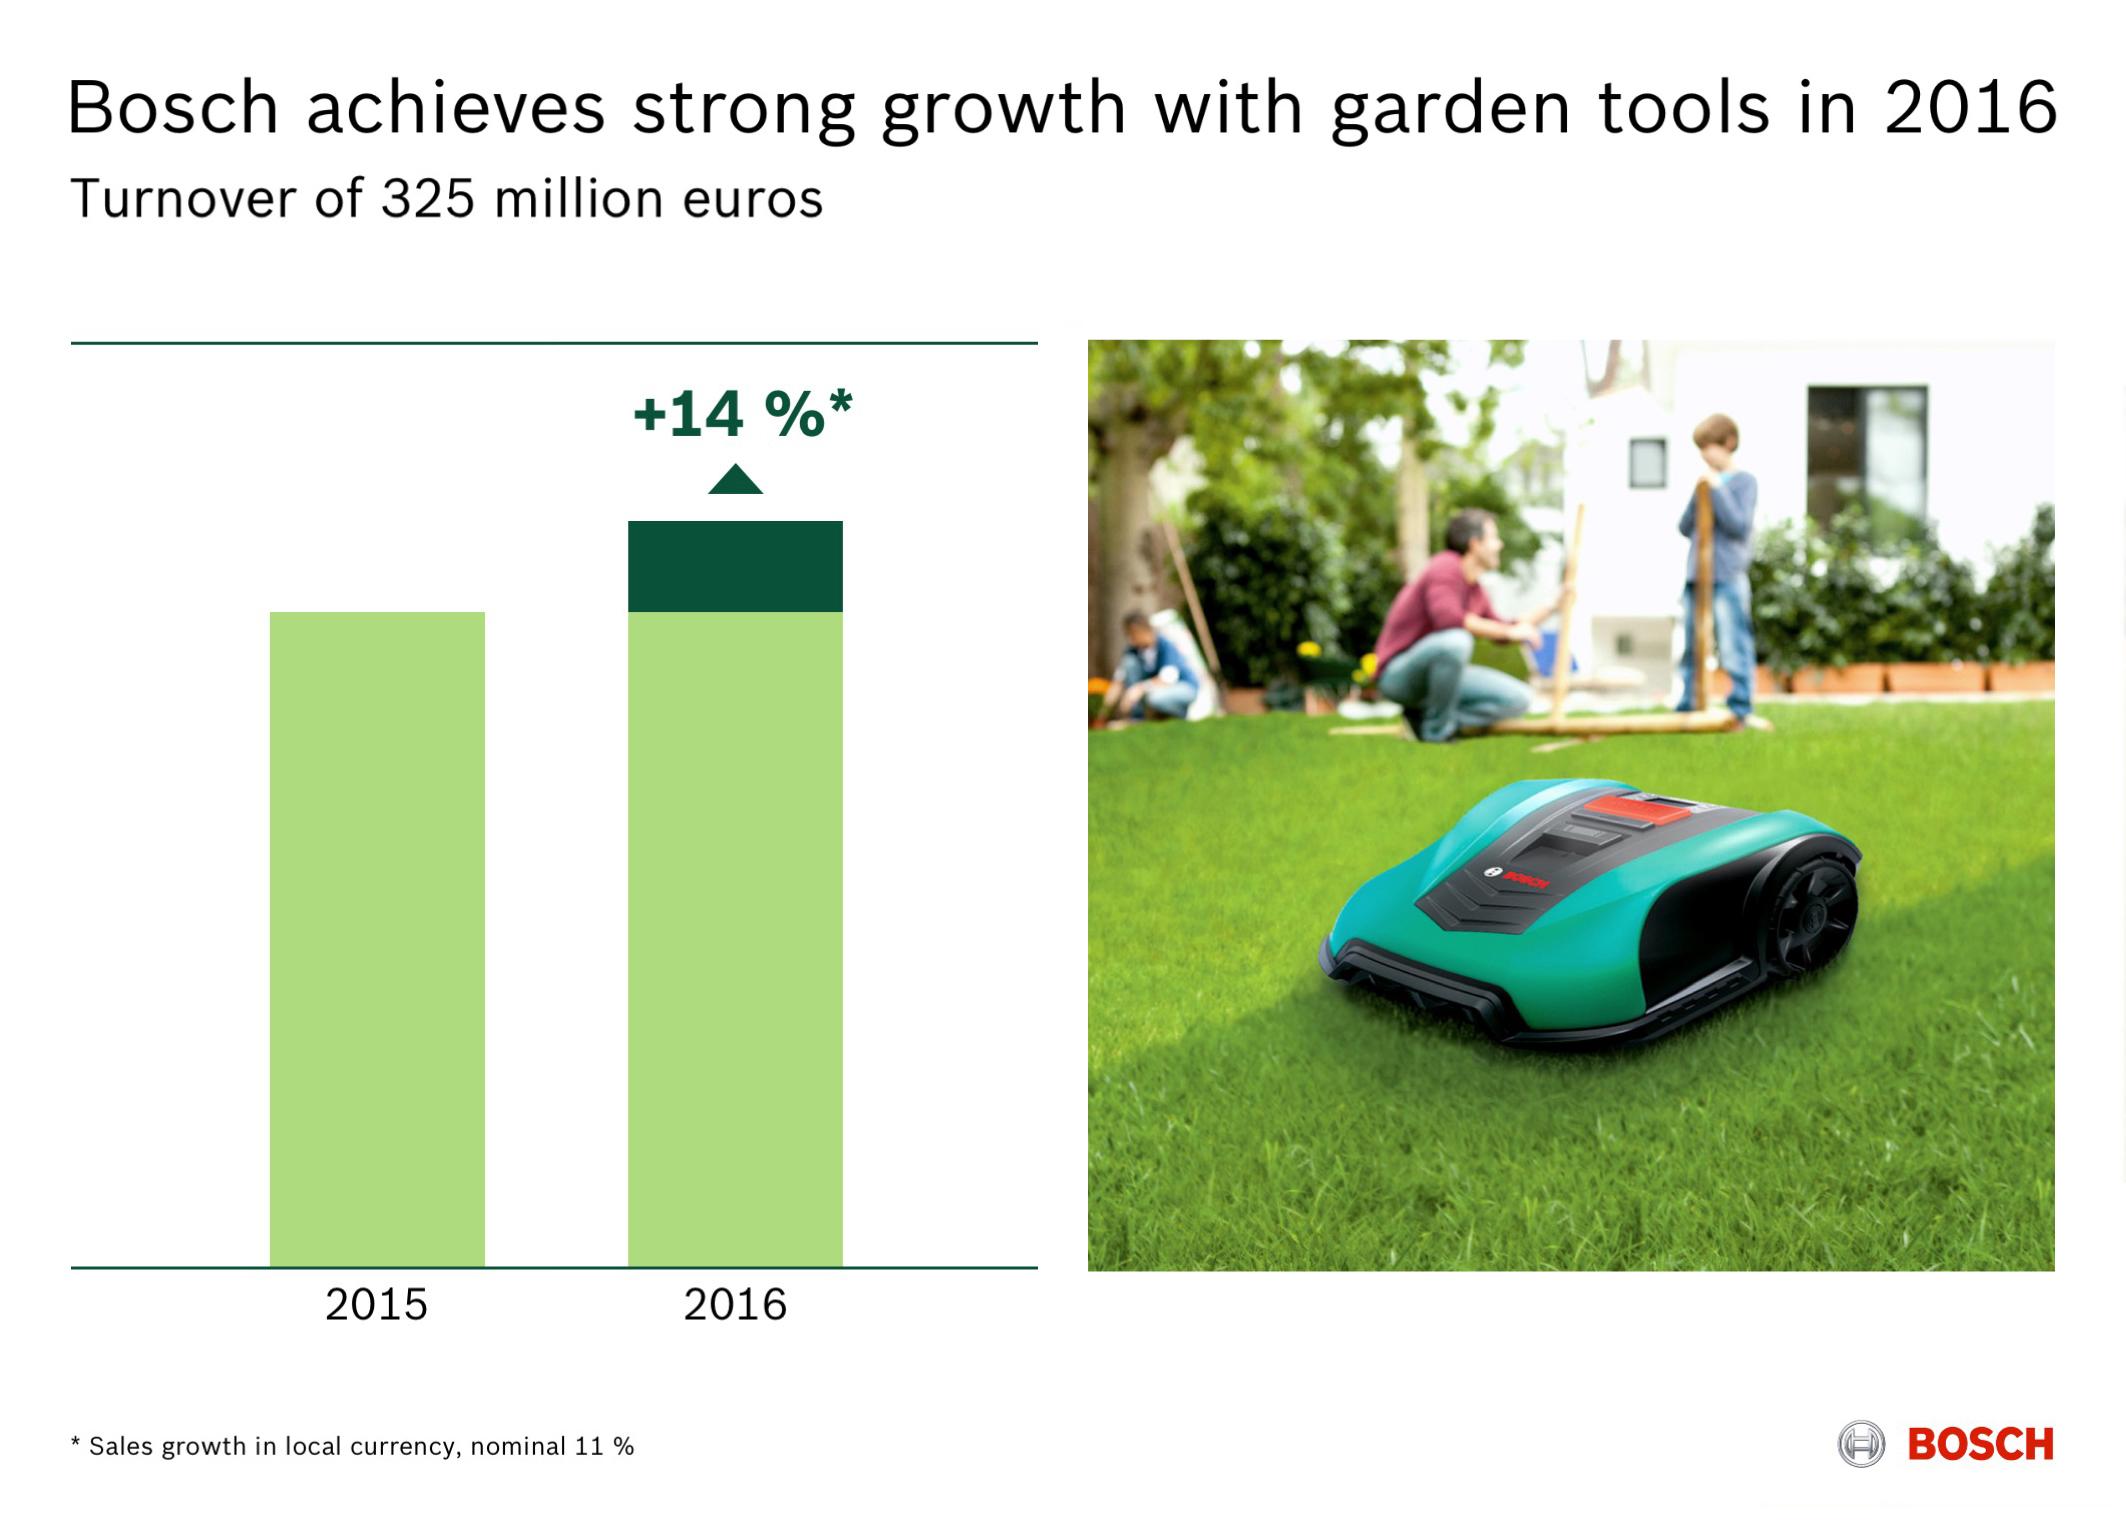 Bosch Power Tools: Garden Tools